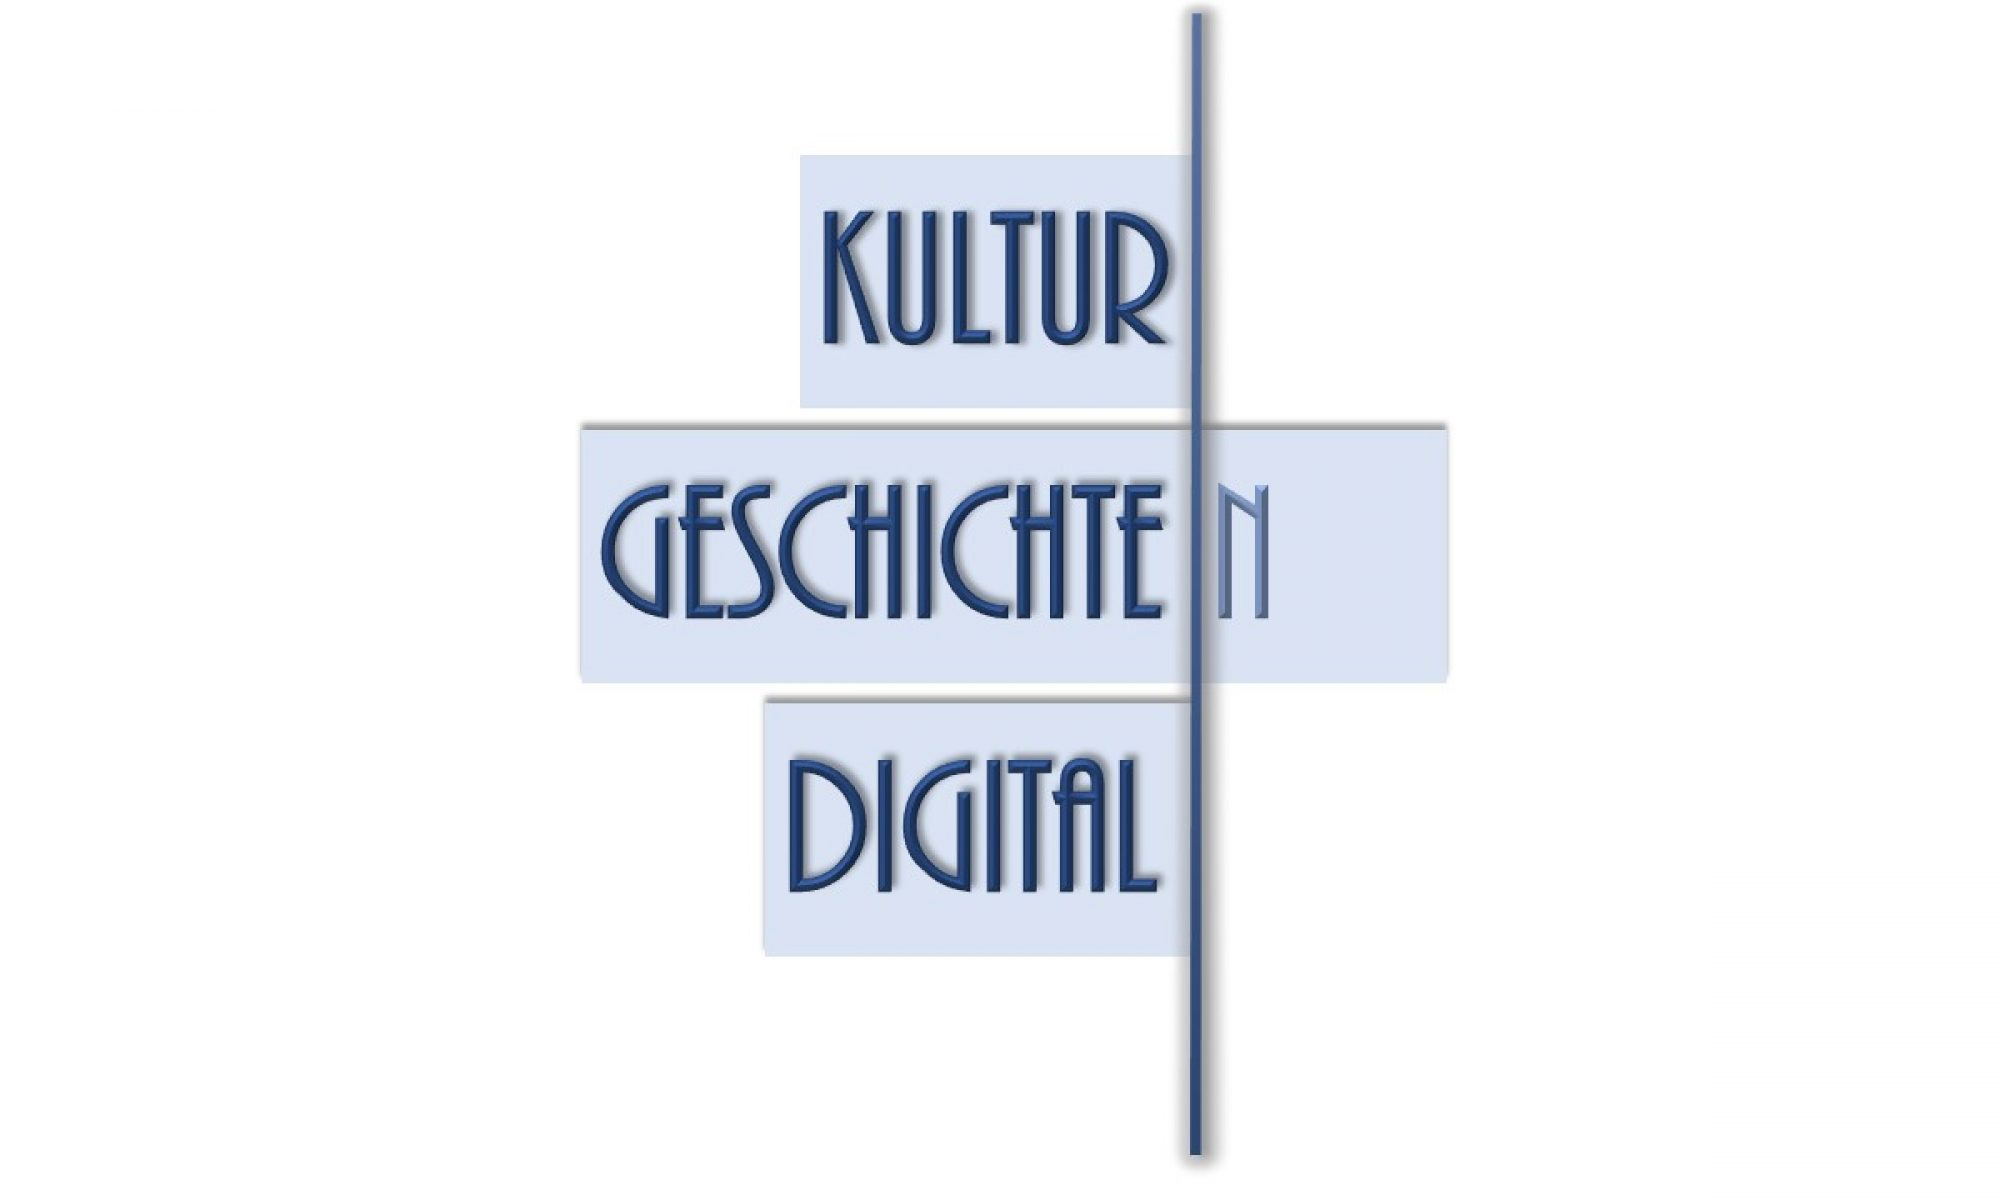 Kultur - Geschichte(n) - Digital